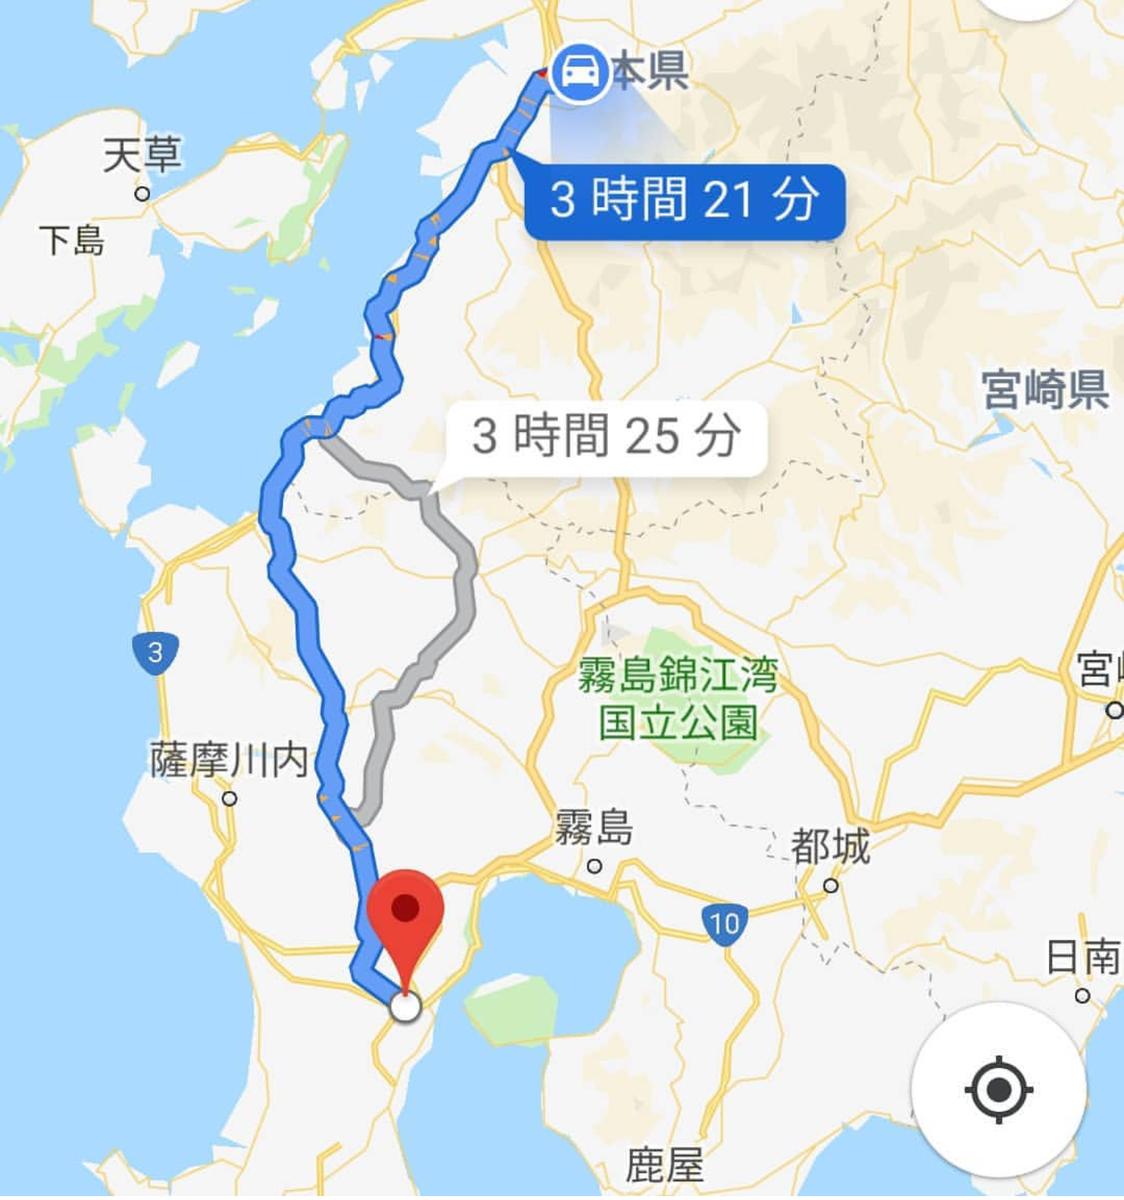 f:id:hiro-964c2:20190814005618p:plain